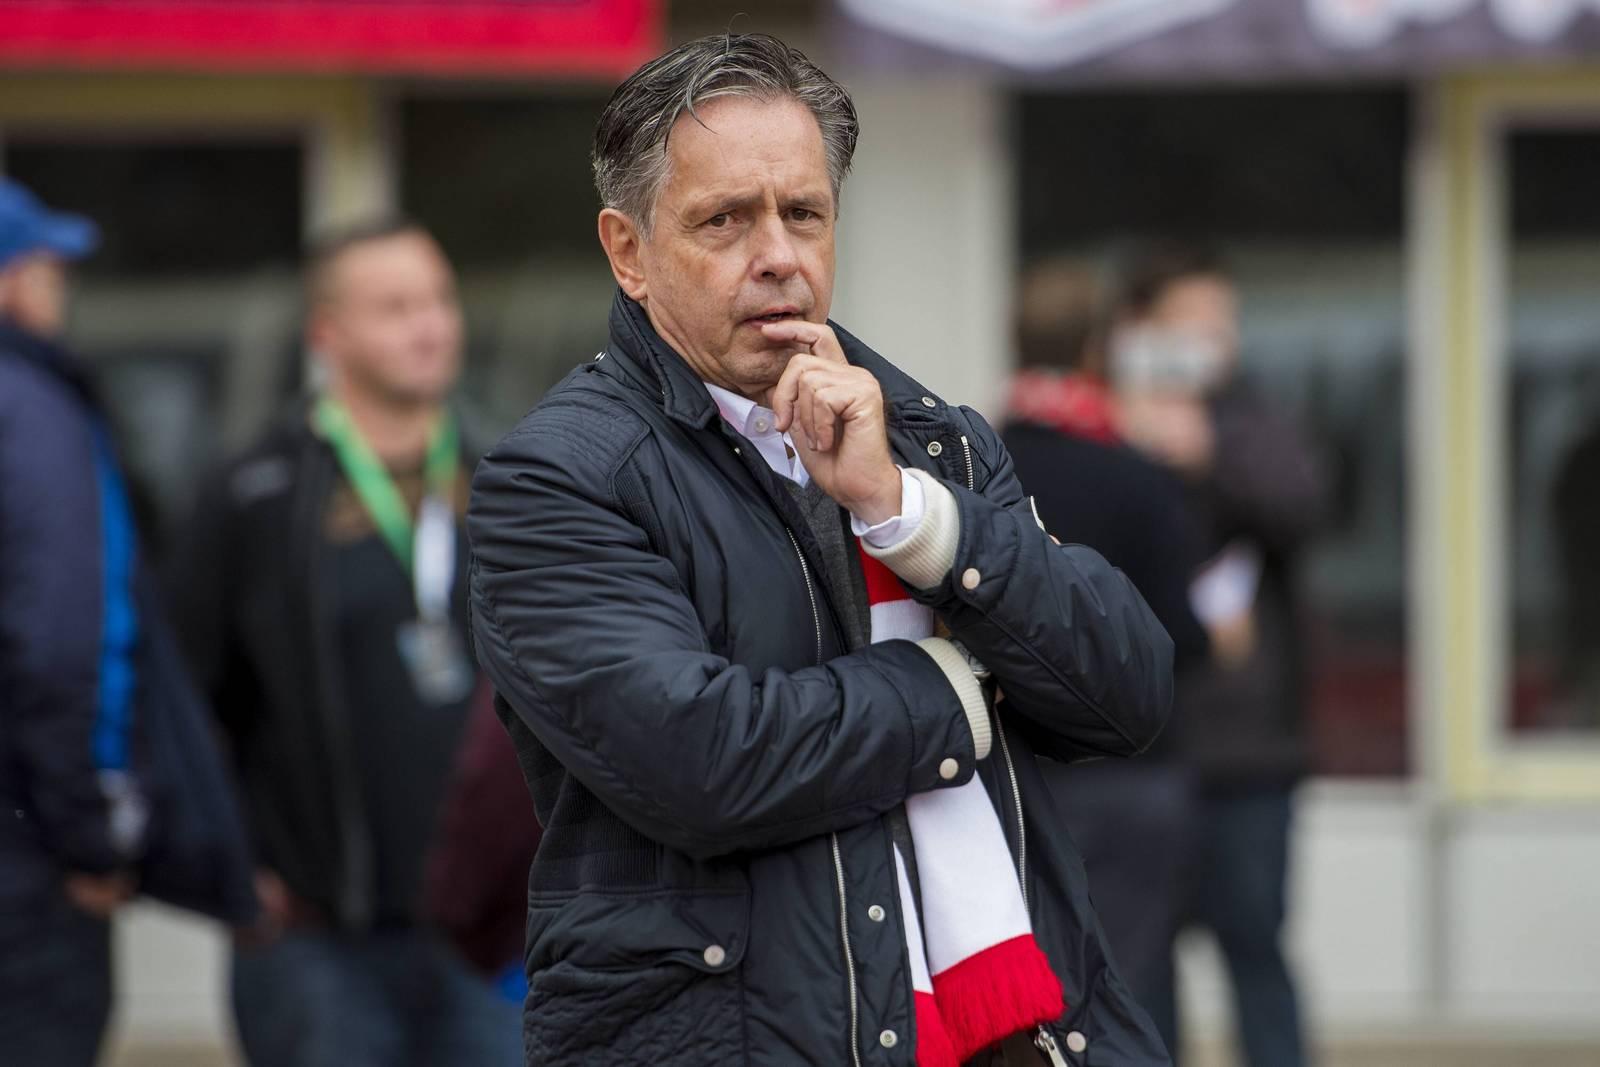 Im Gegenwind: RWE-Boss Rolf Rombach